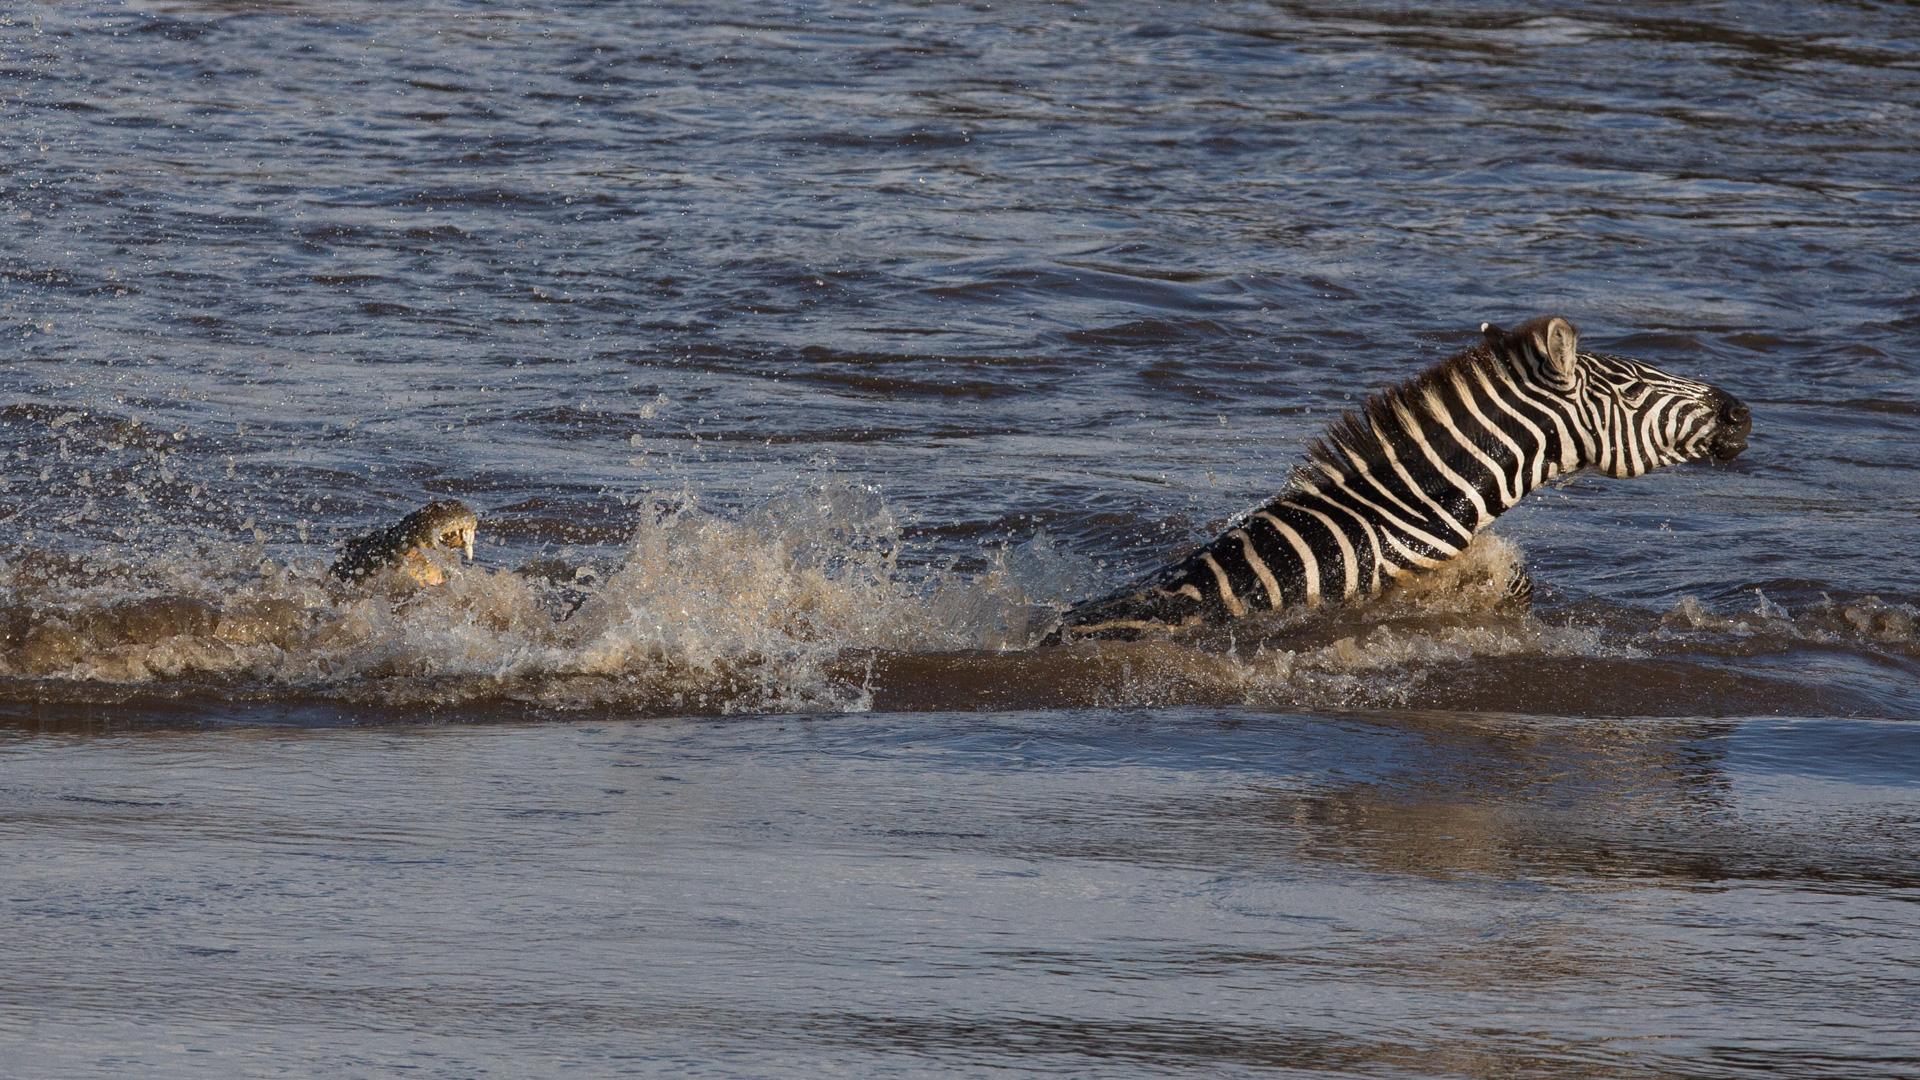 Zebra fighting crocodile